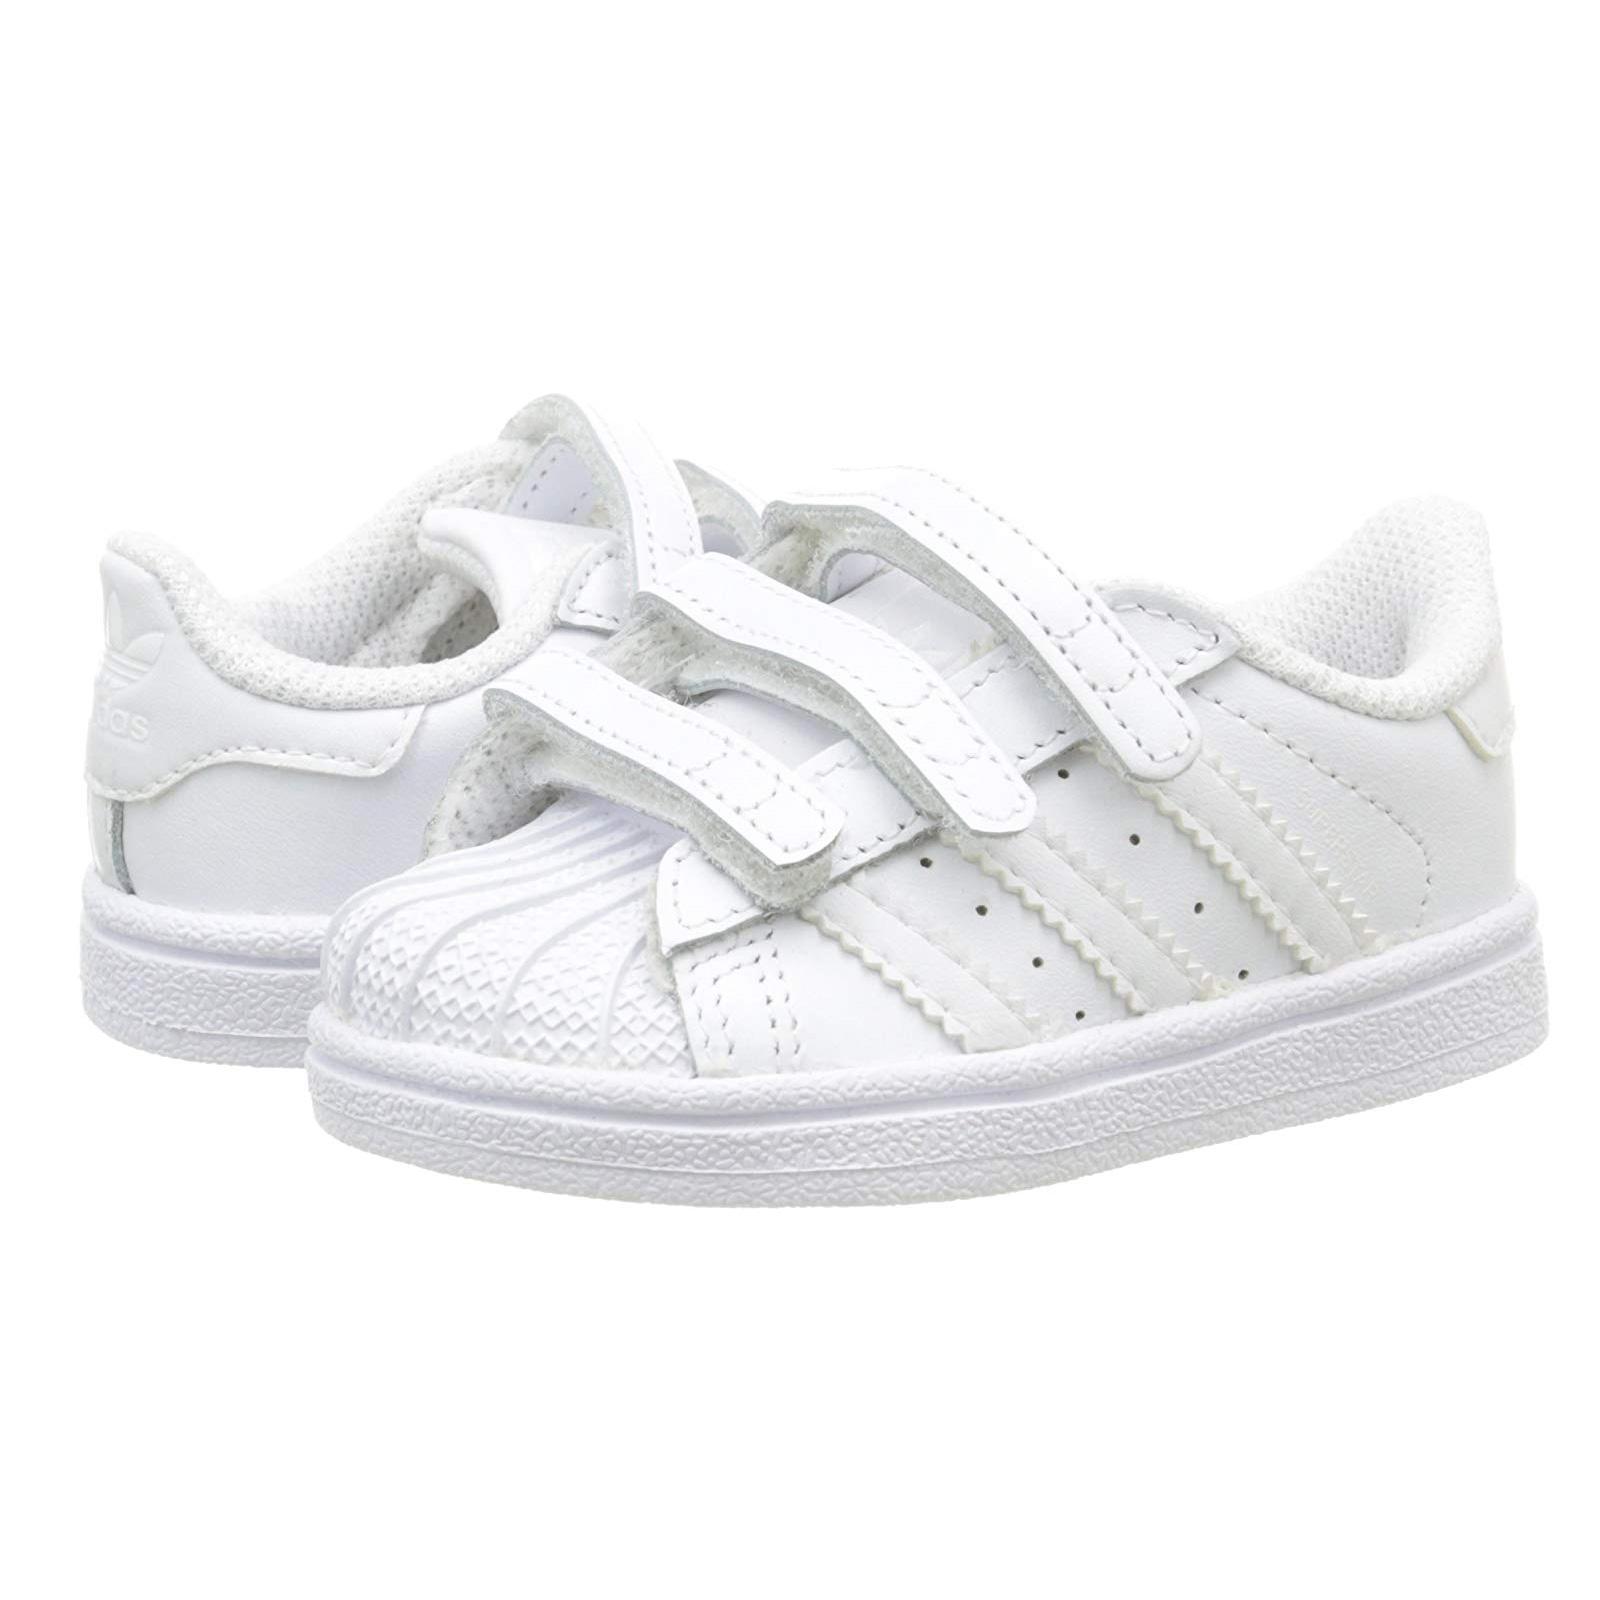 Neue Adidas Originals Superstar 360 Baby 2019 Adidas